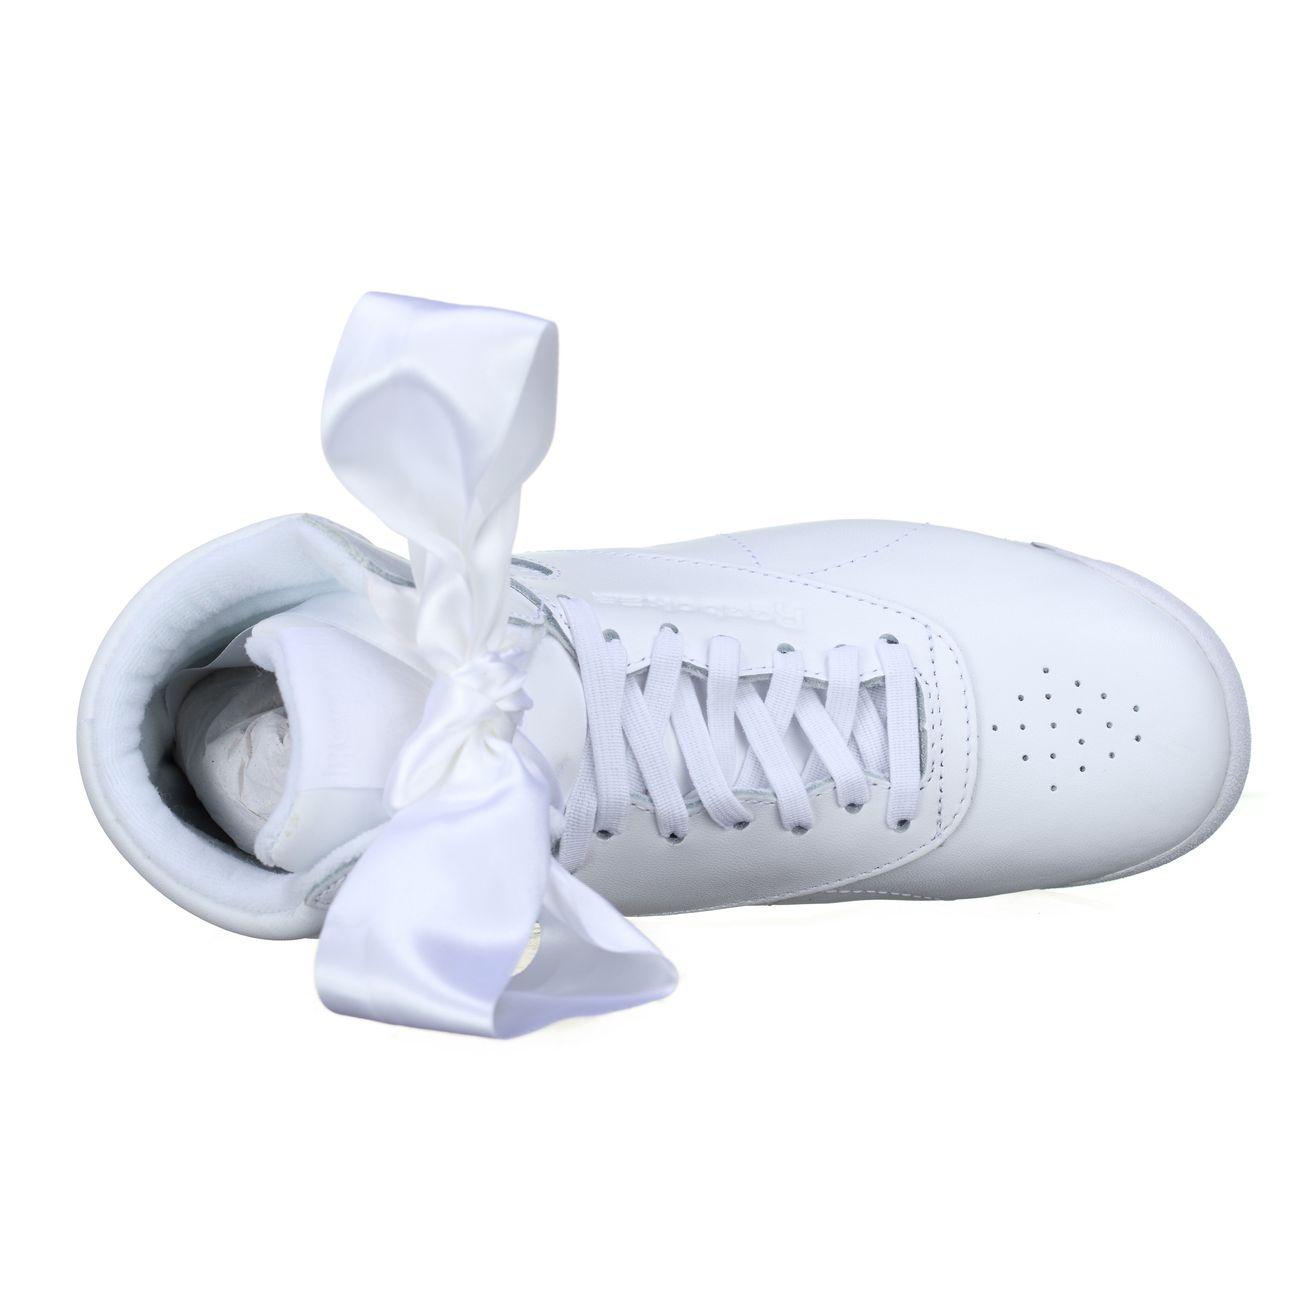 Mode Lifestyle femme REEBOK Basket Reebok Freestyle Hi Satin Bow Ref. CM8903